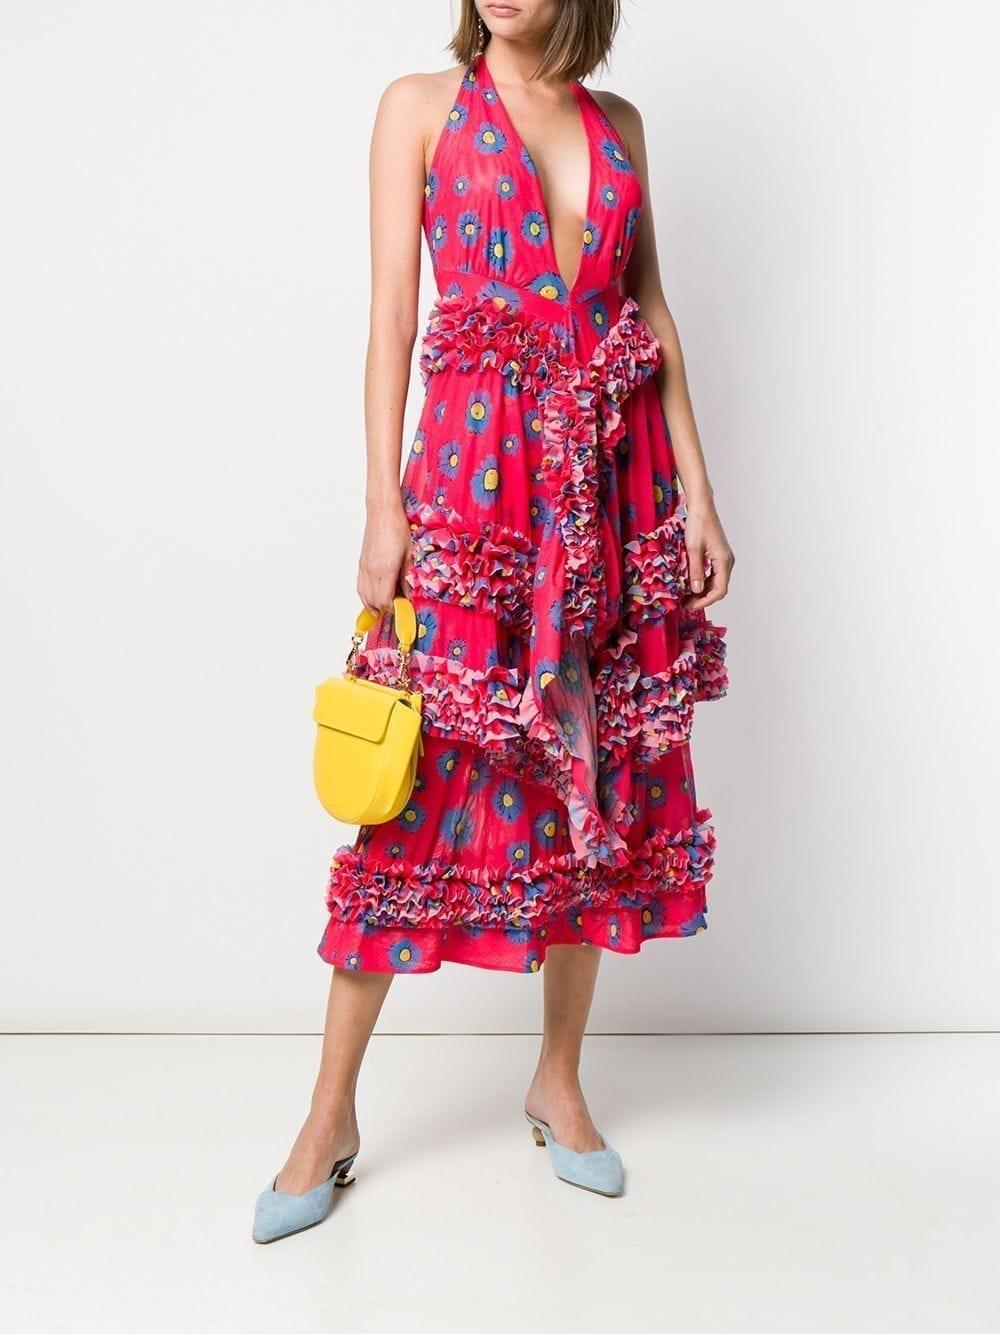 MOLLY GODDARD Daisy Print Ruffle Red Dress